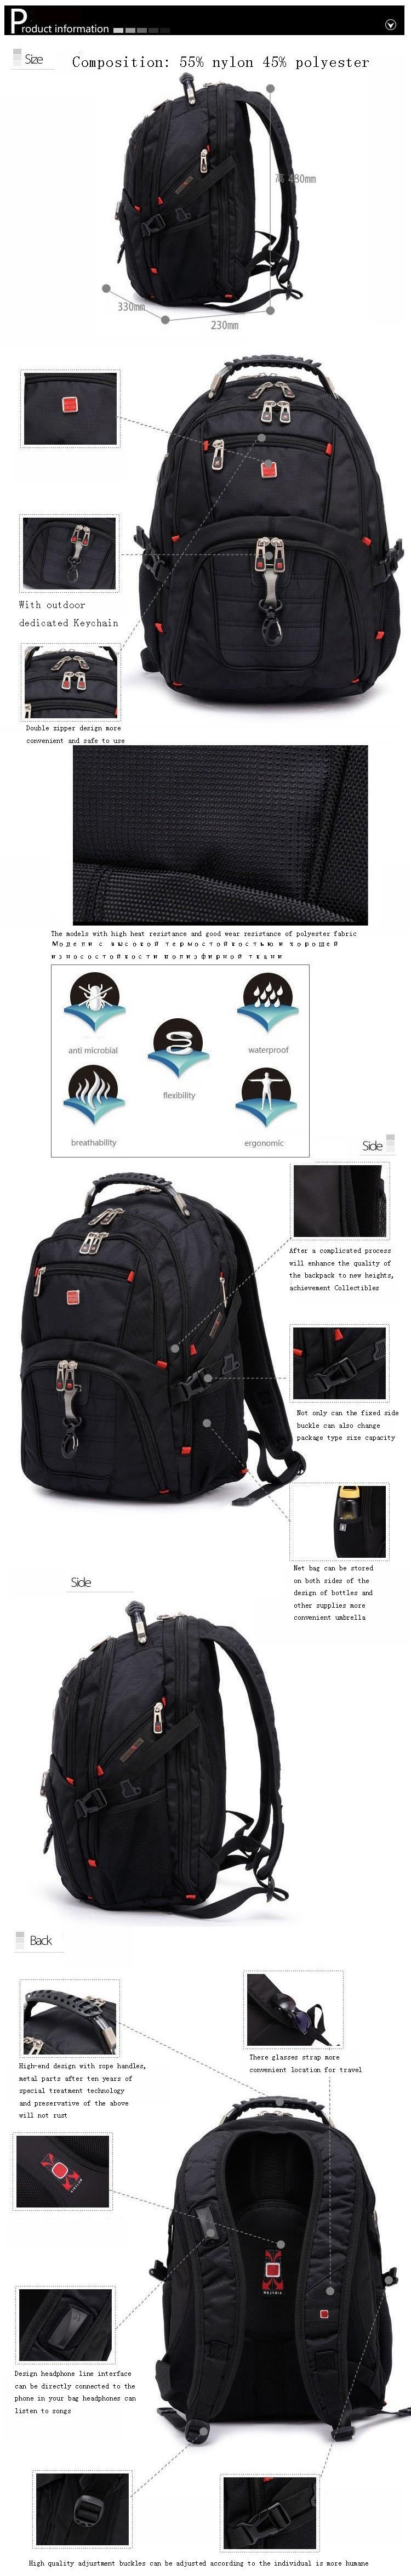 MAGIC UNION Oxford Men Laptop Backpack Mochila Masculina 15 Inch Man's Backpacks Men's Luggage & Travel bags Wholesale 5